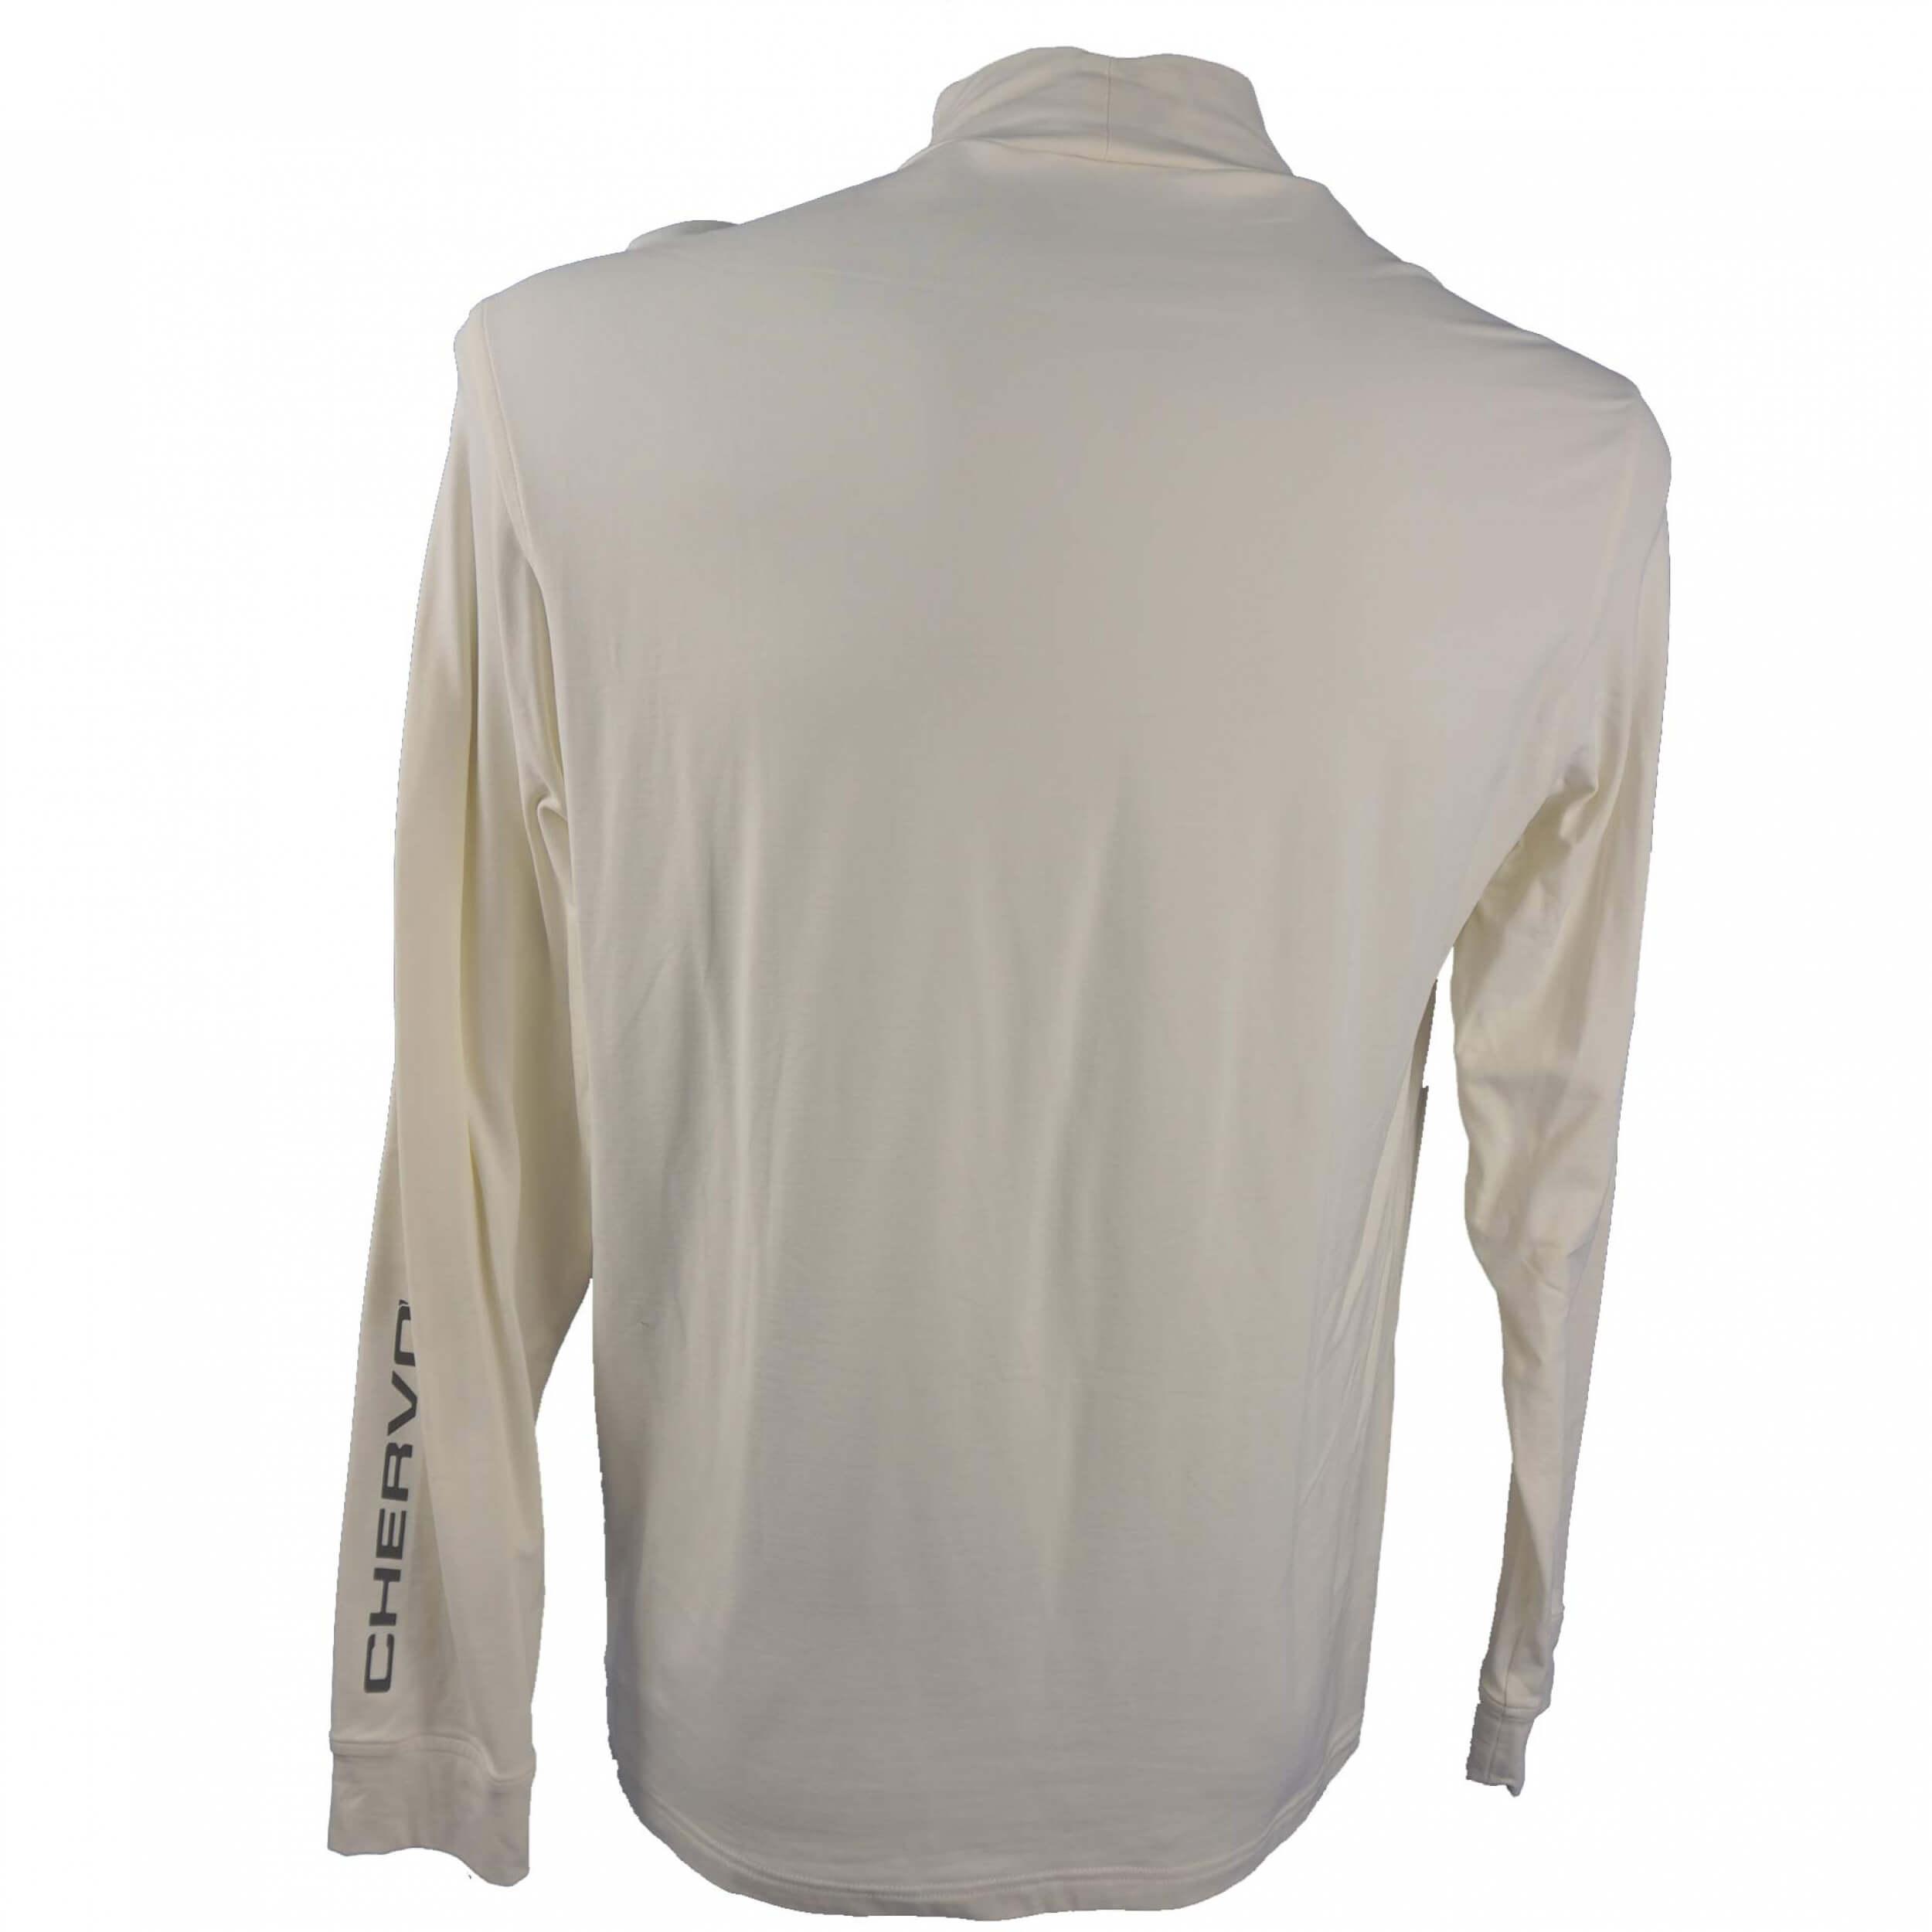 Chervo Herren Shirt Rolli Takione creme 2.Wahl